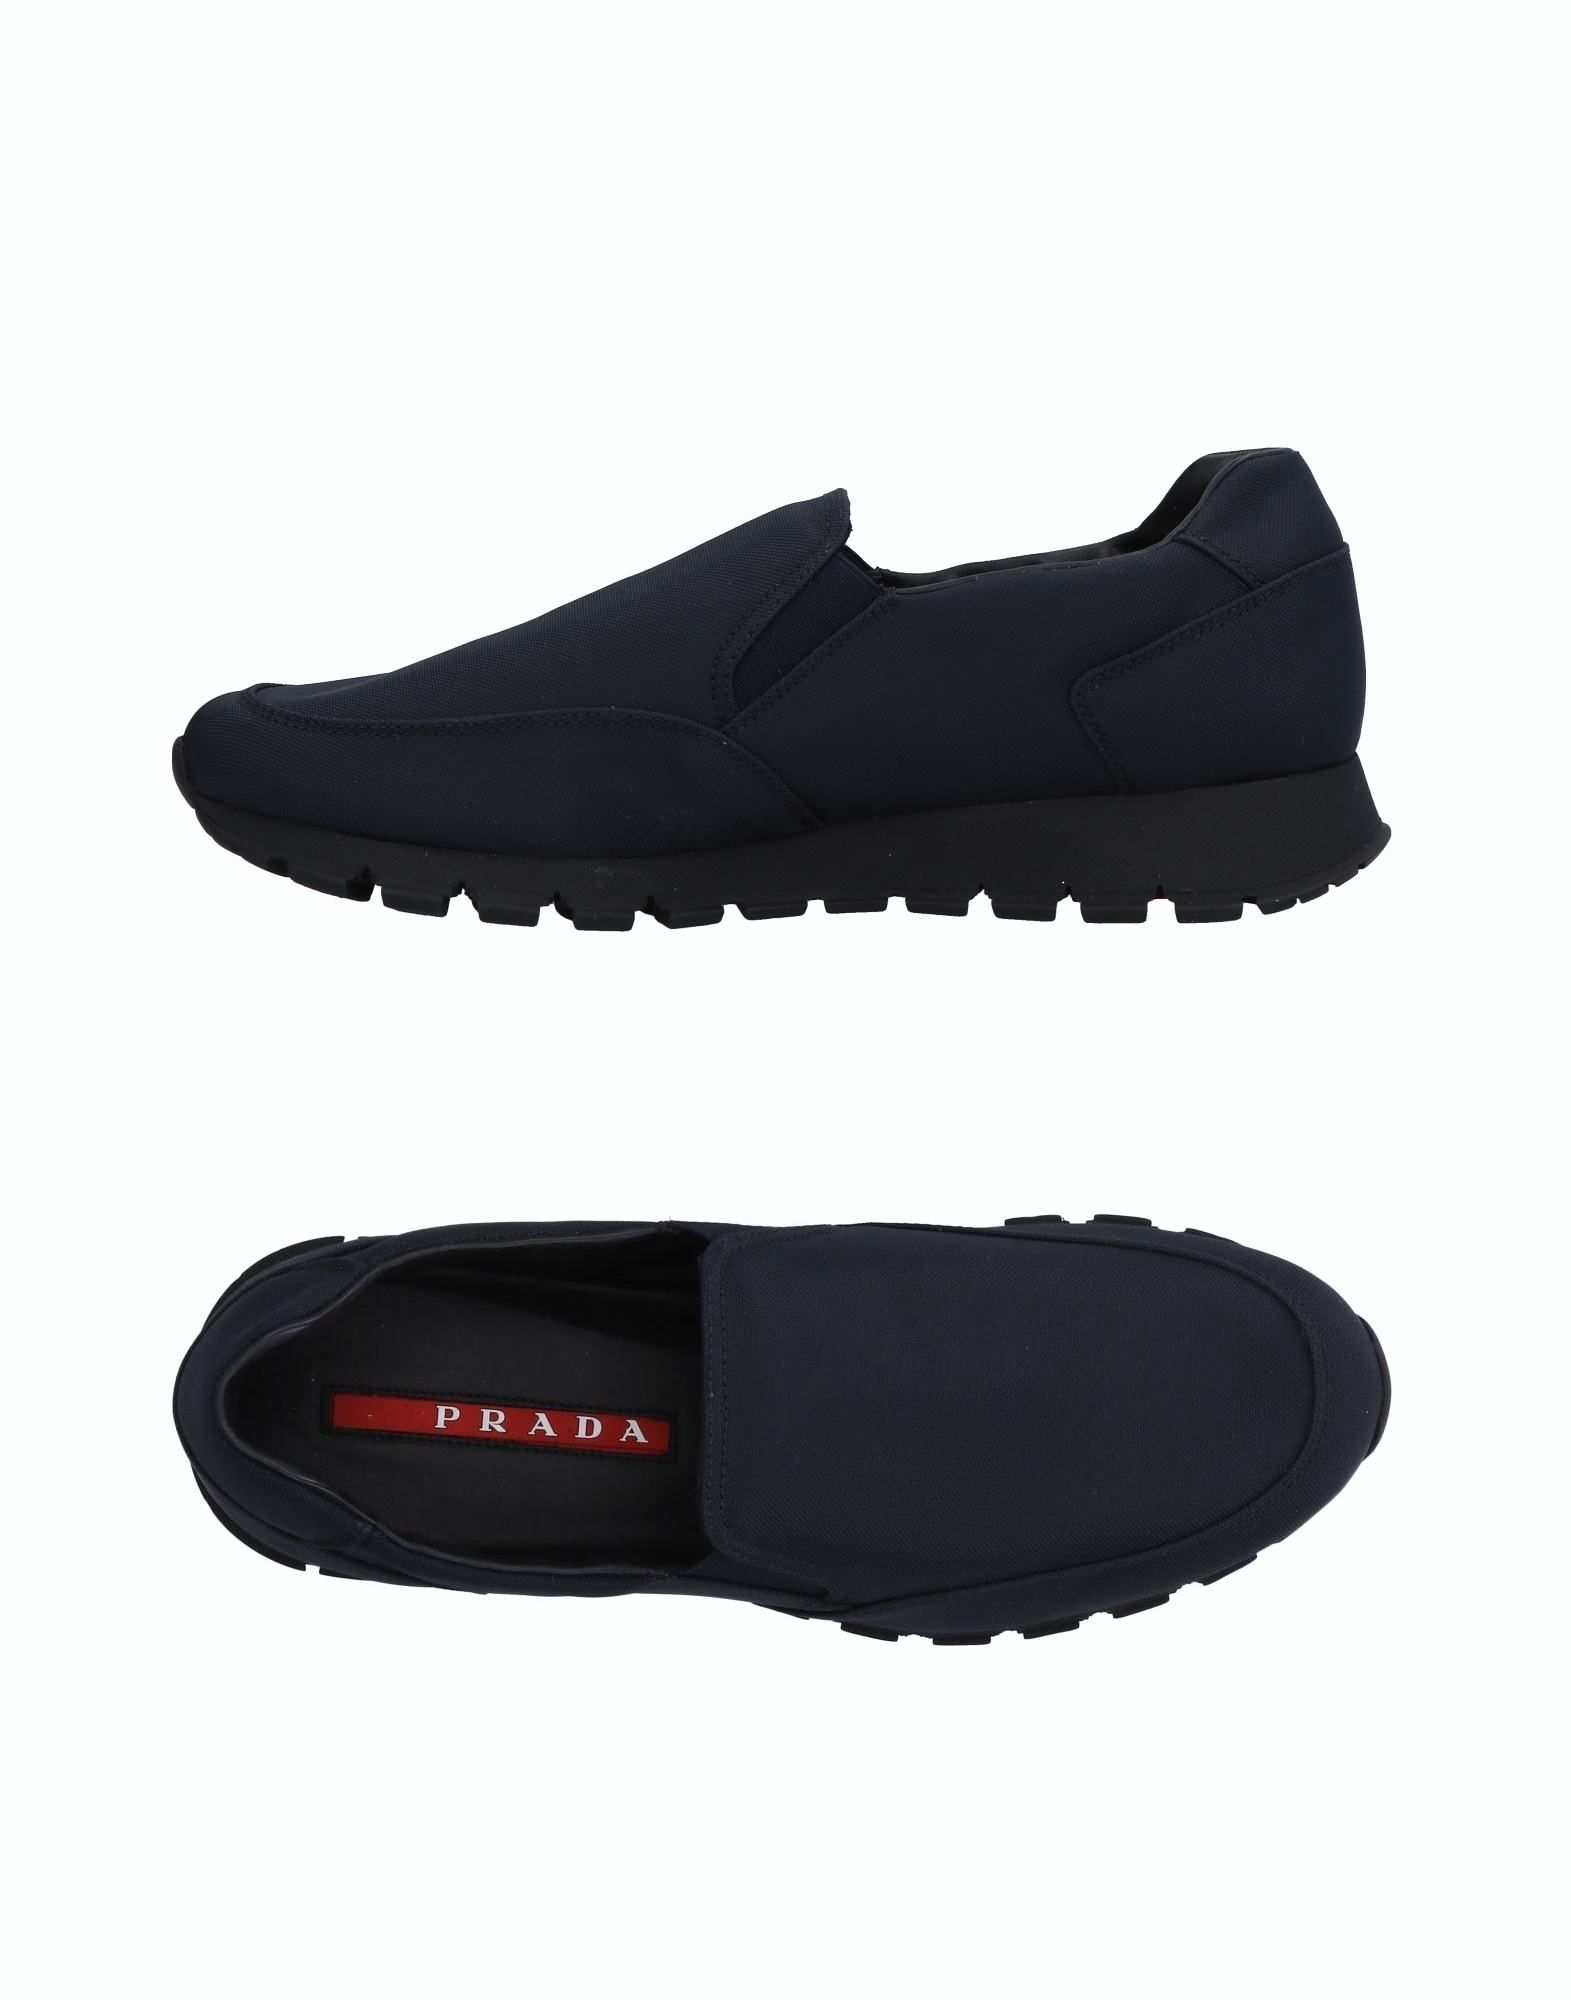 Prada Sport Sneakers Schuhe Herren  11392059HO Neue Schuhe Sneakers b3803f